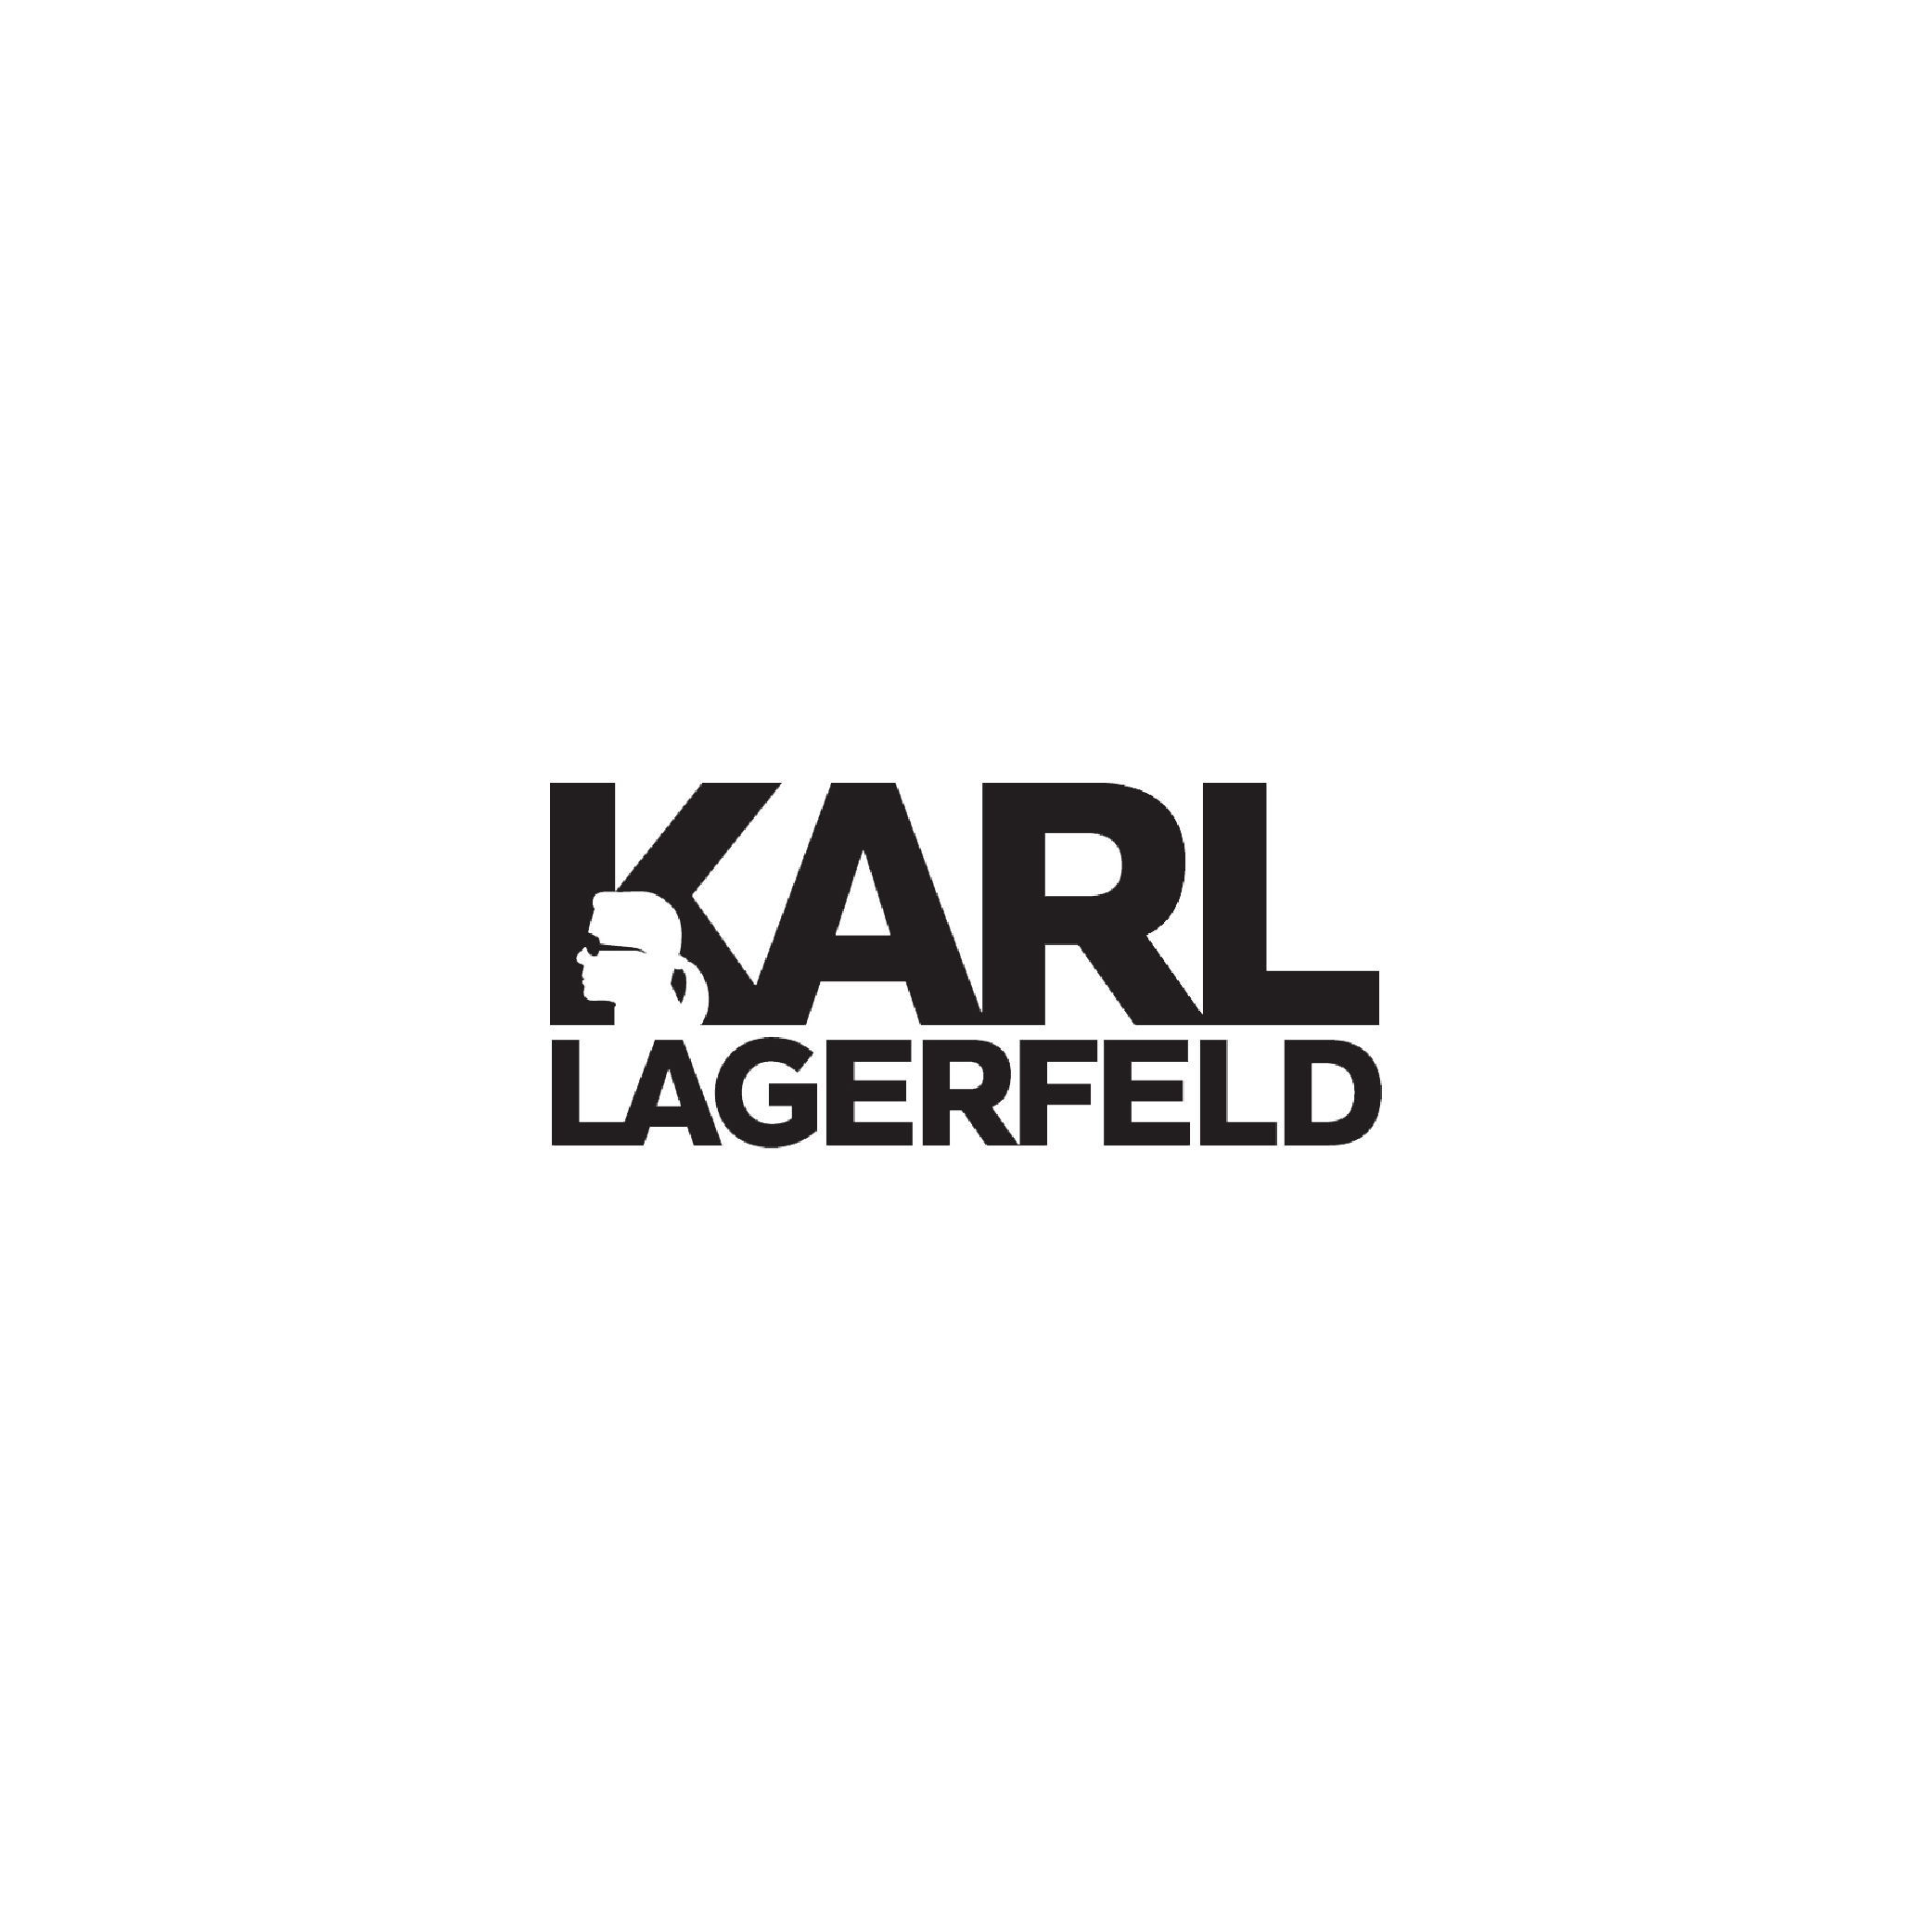 karl-lagerfeld.png